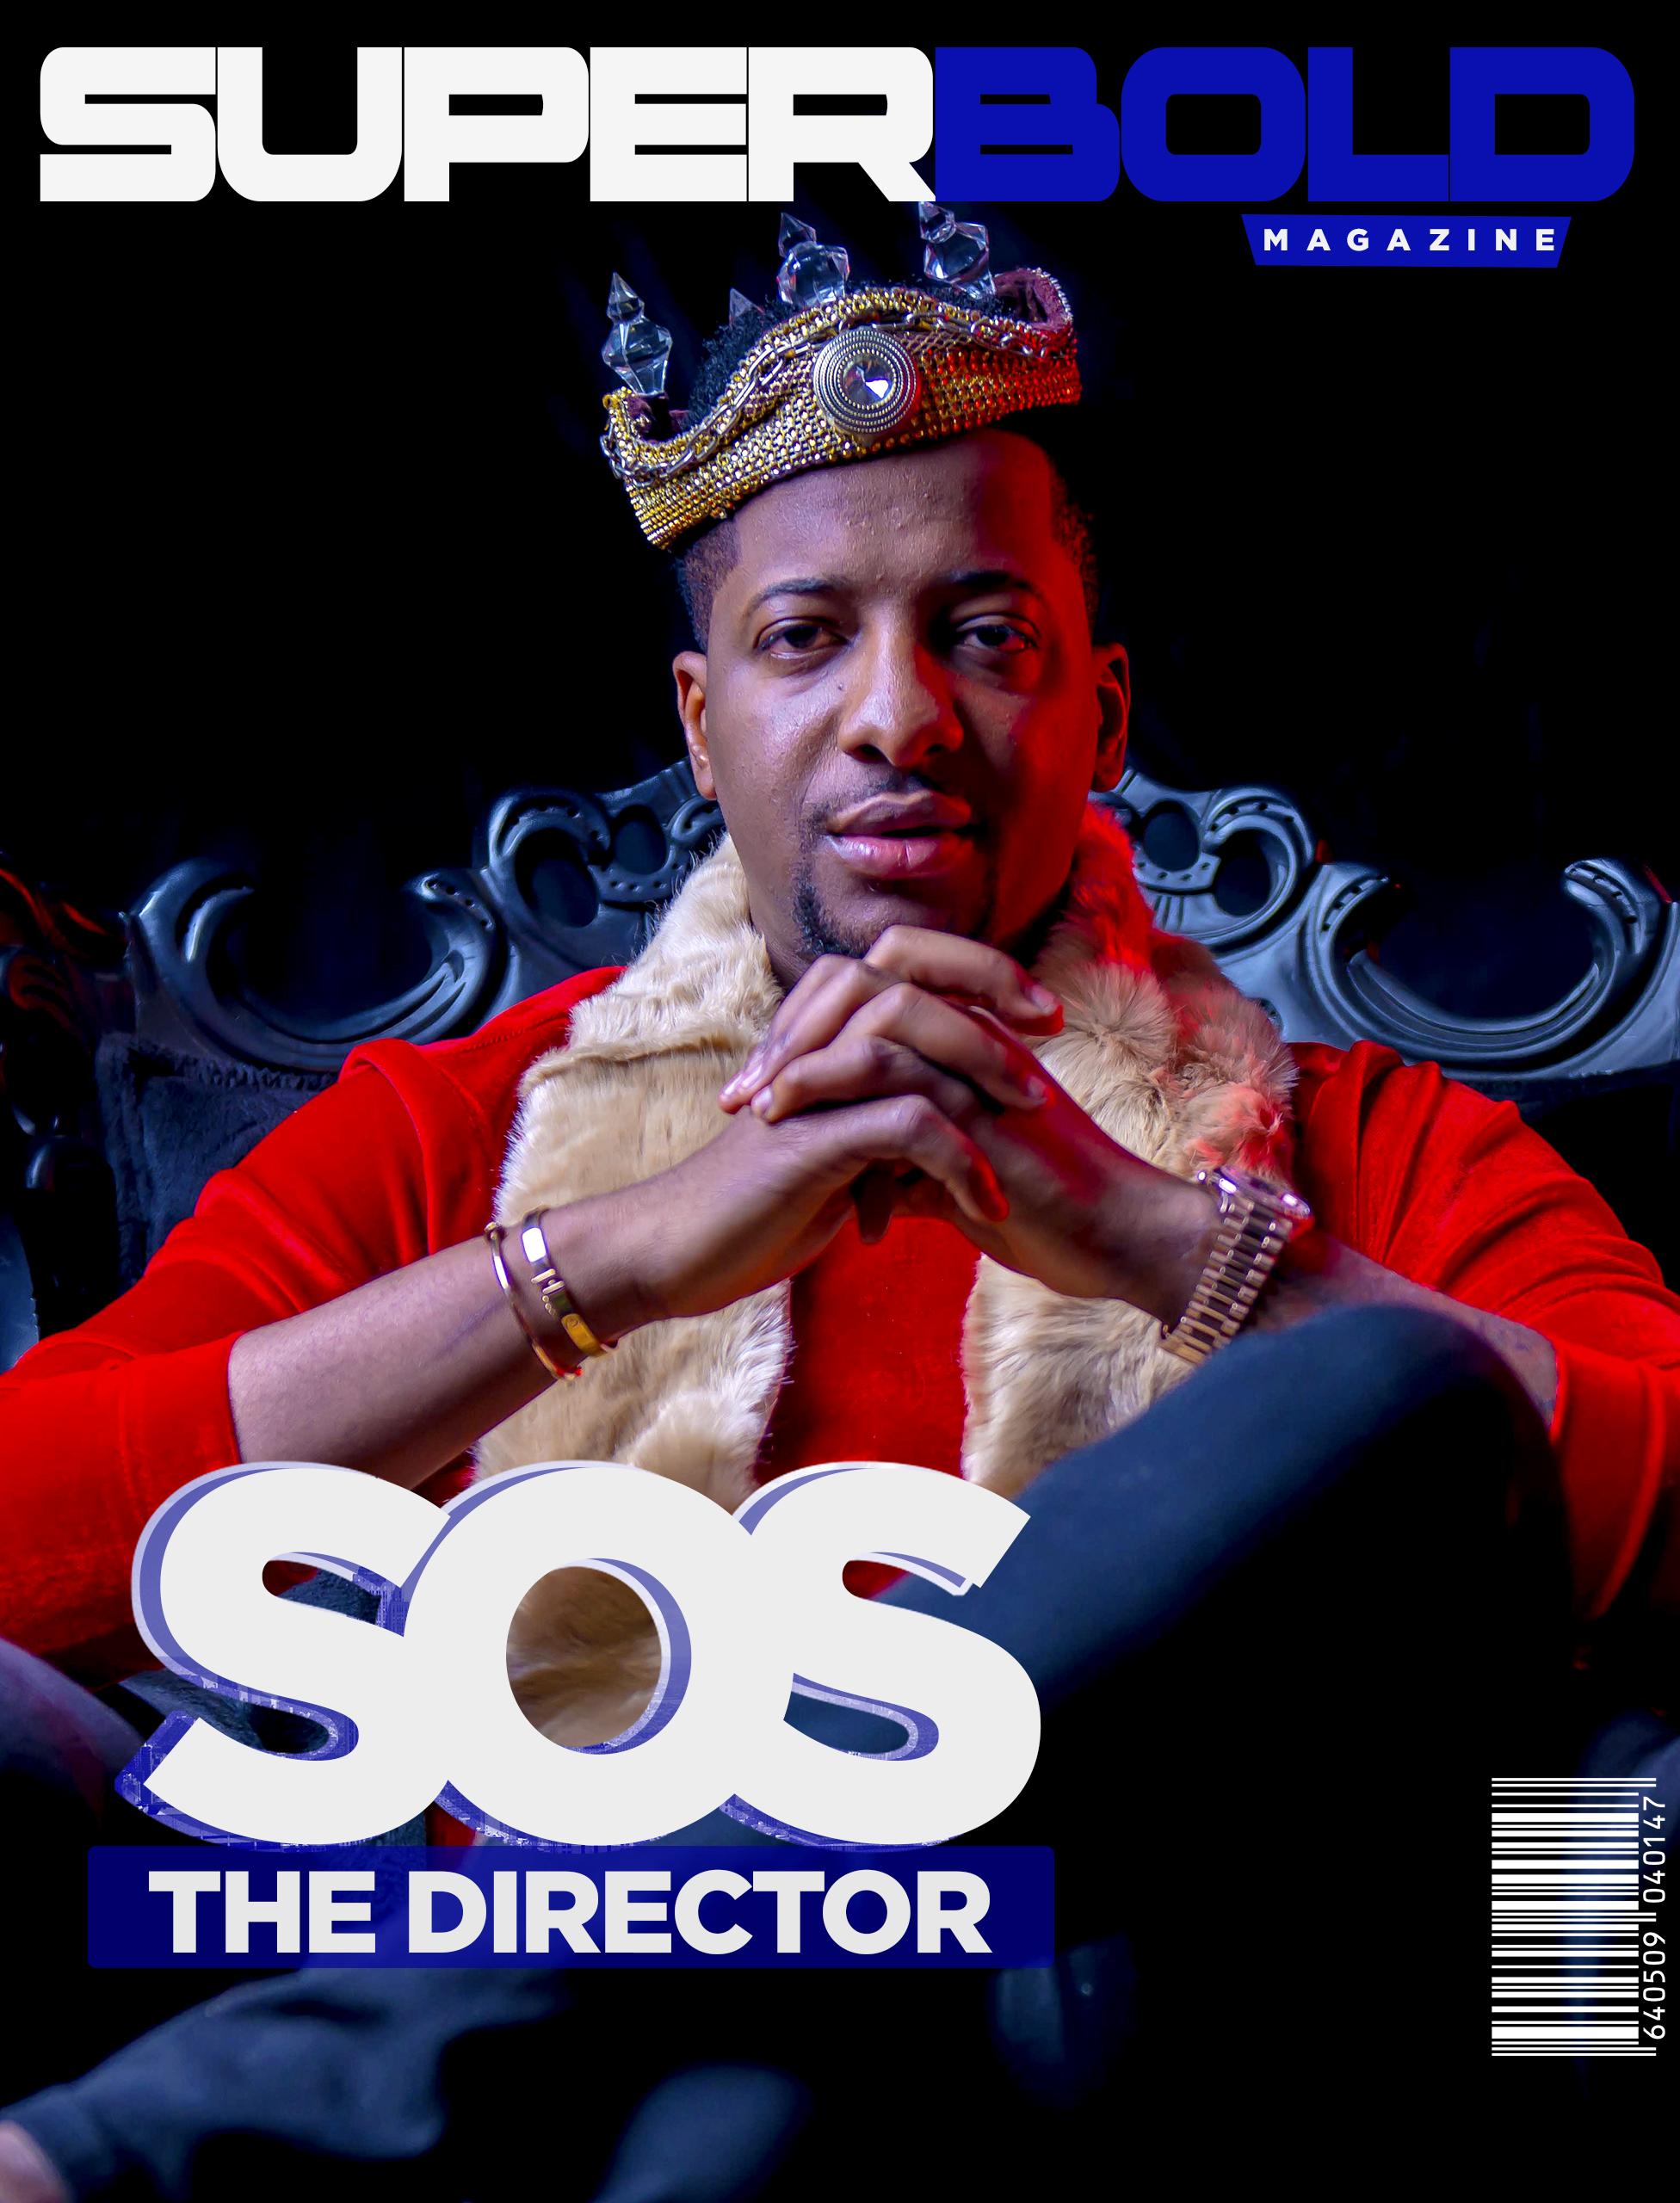 SOS THE DIRECTOR